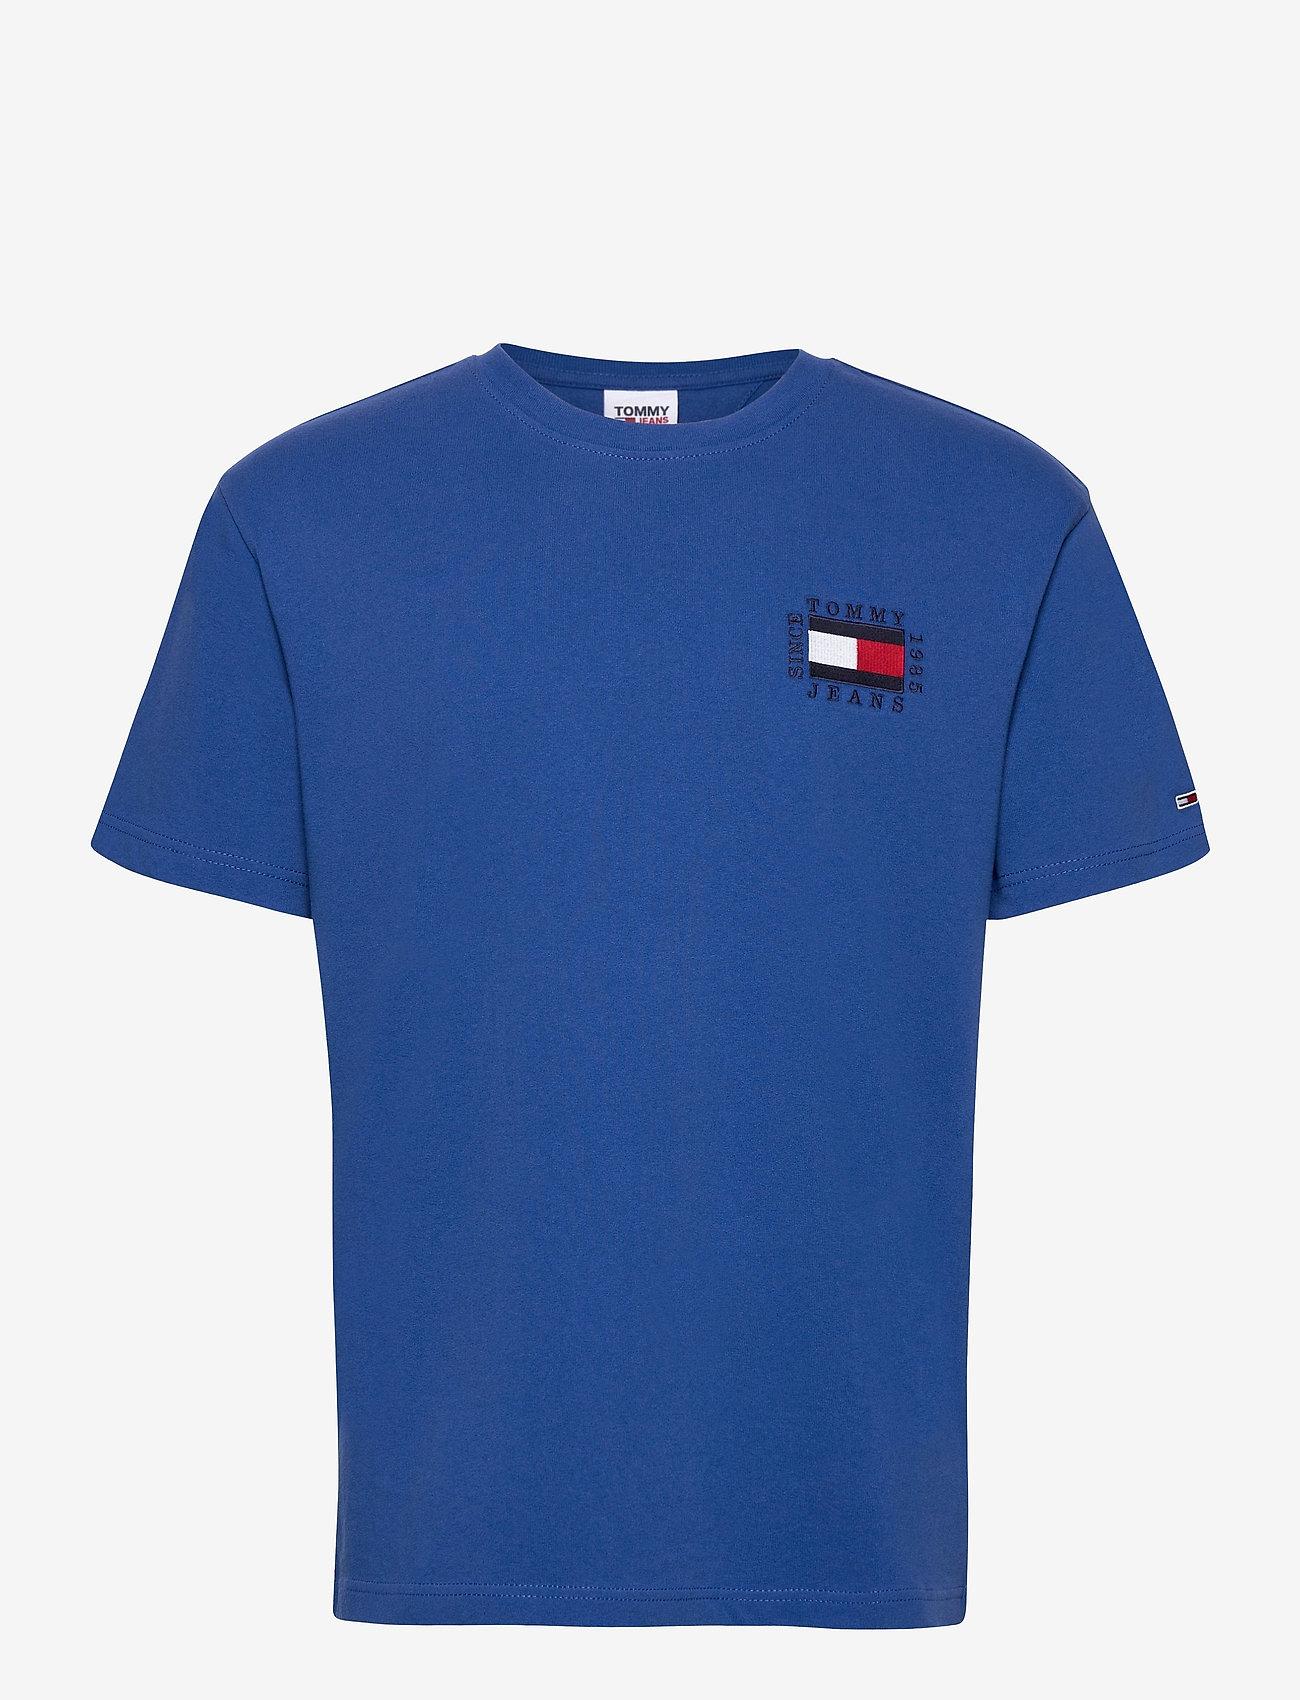 Tommy Jeans - TJM BOX FLAG TEE - basic t-shirts - providence blue - 0